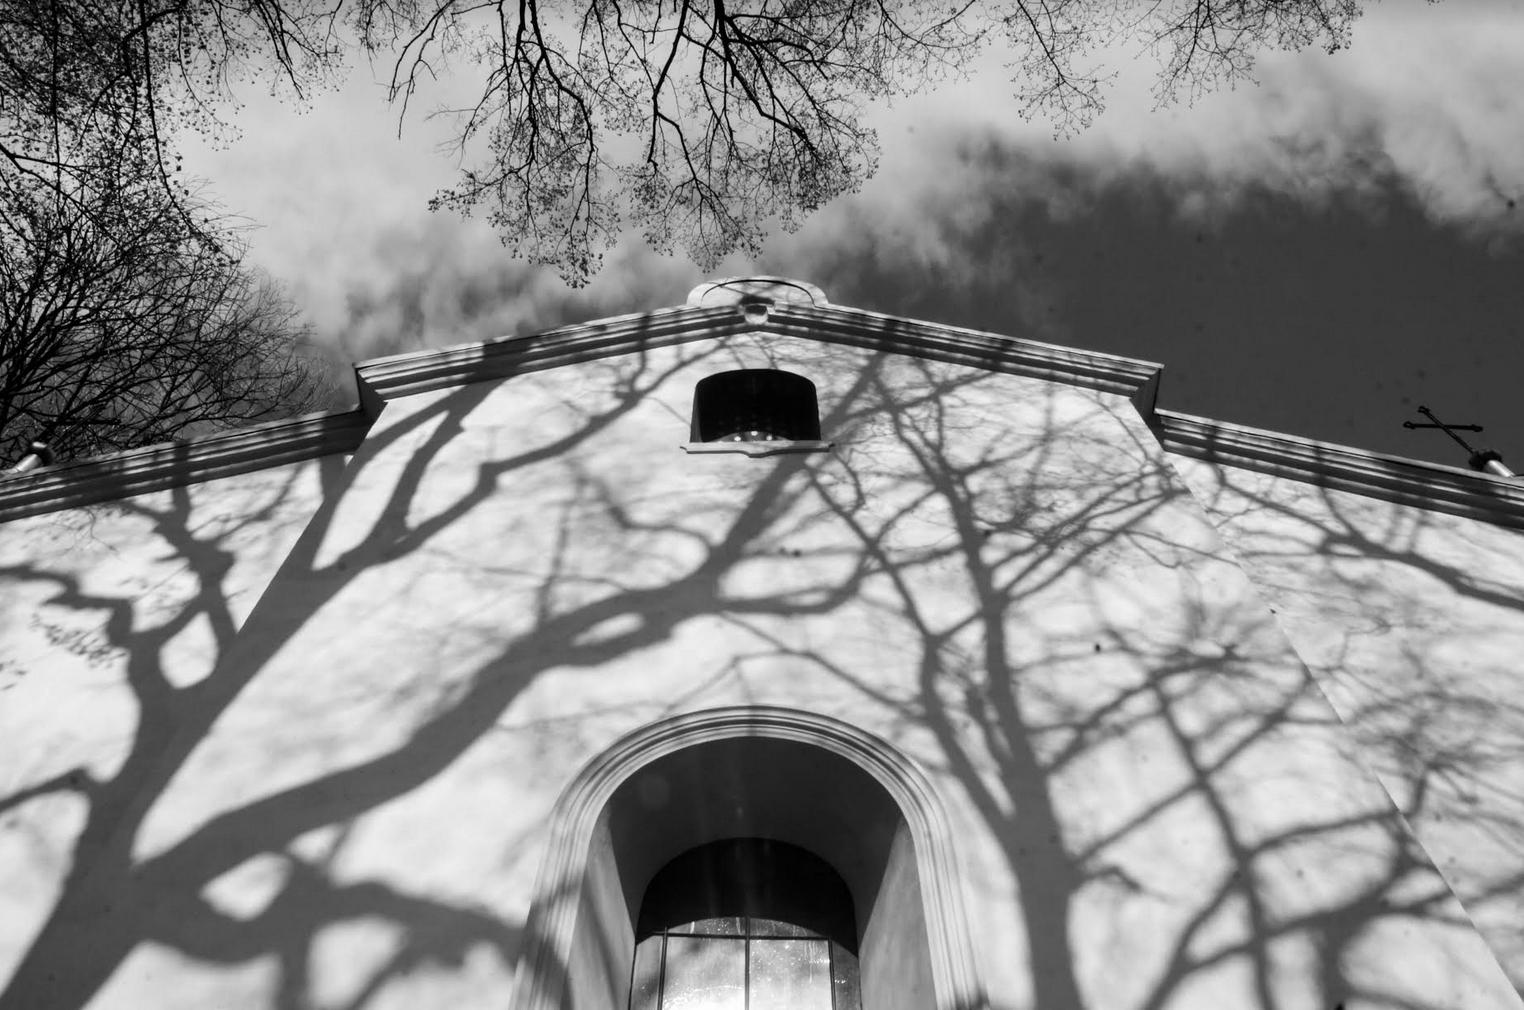 Cerkiew otwarta